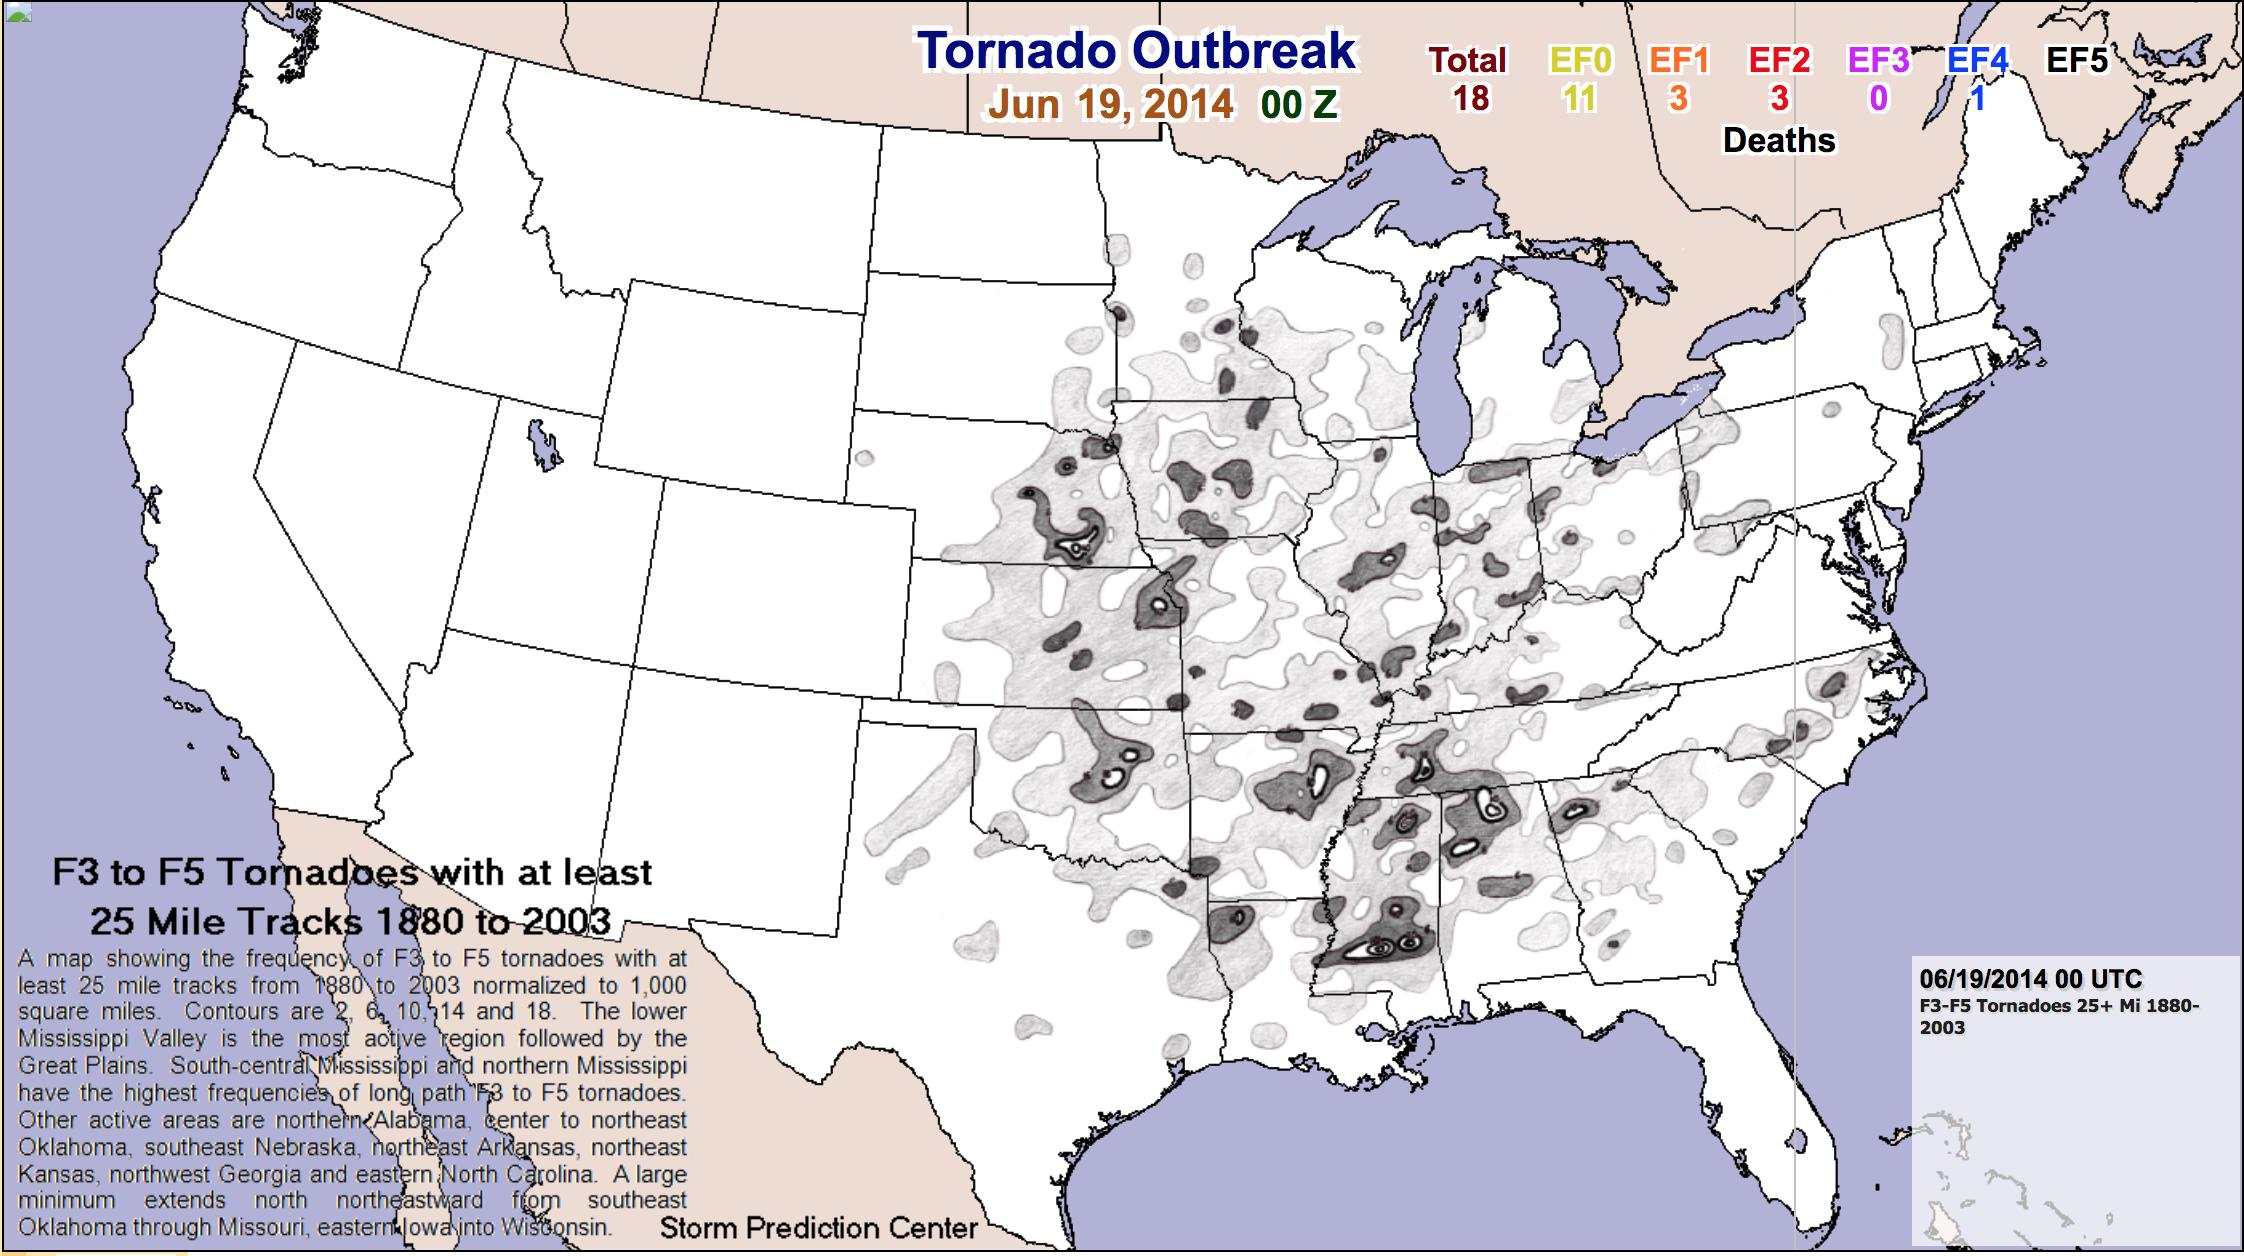 Tornado Outbreak Map - June 19, 2014